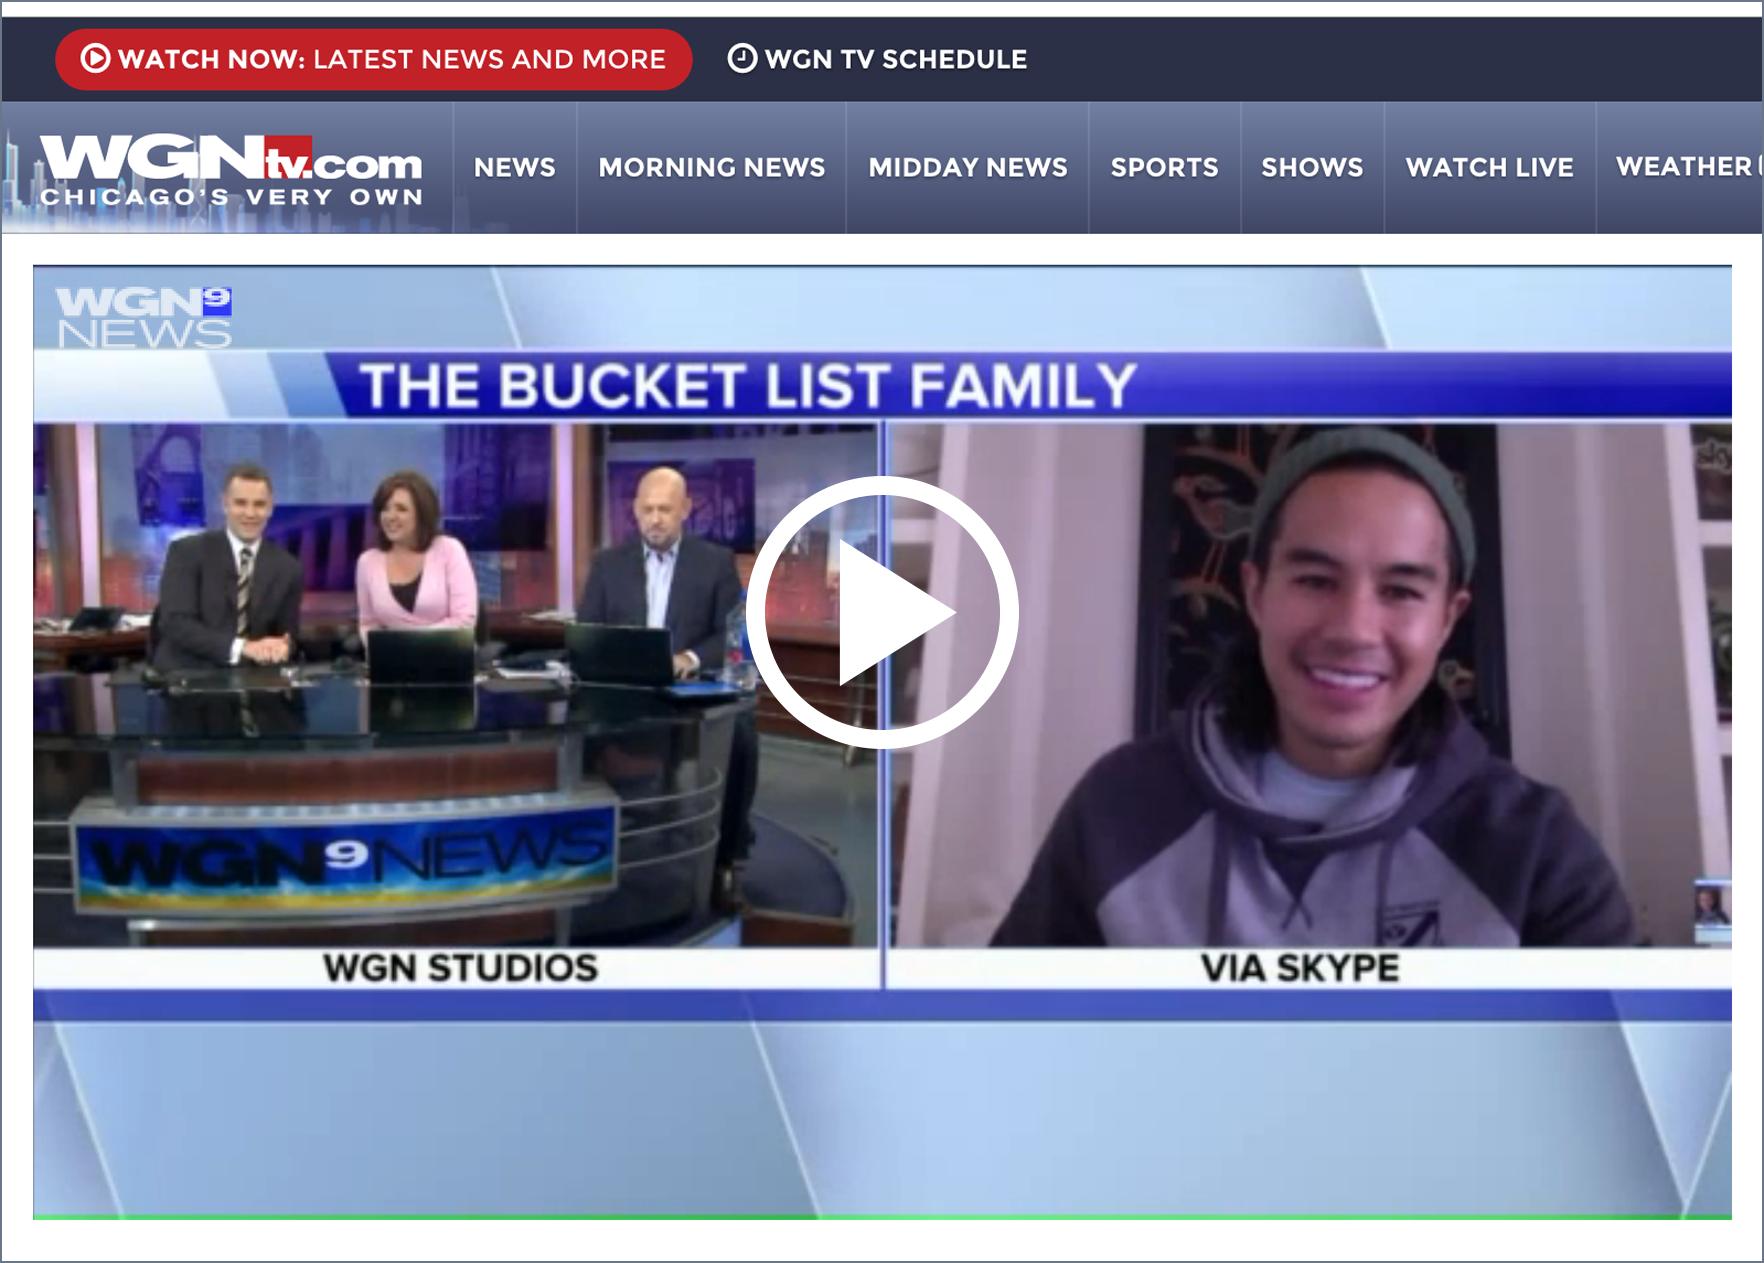 the-bucket-list-family-news-fox-aol.png